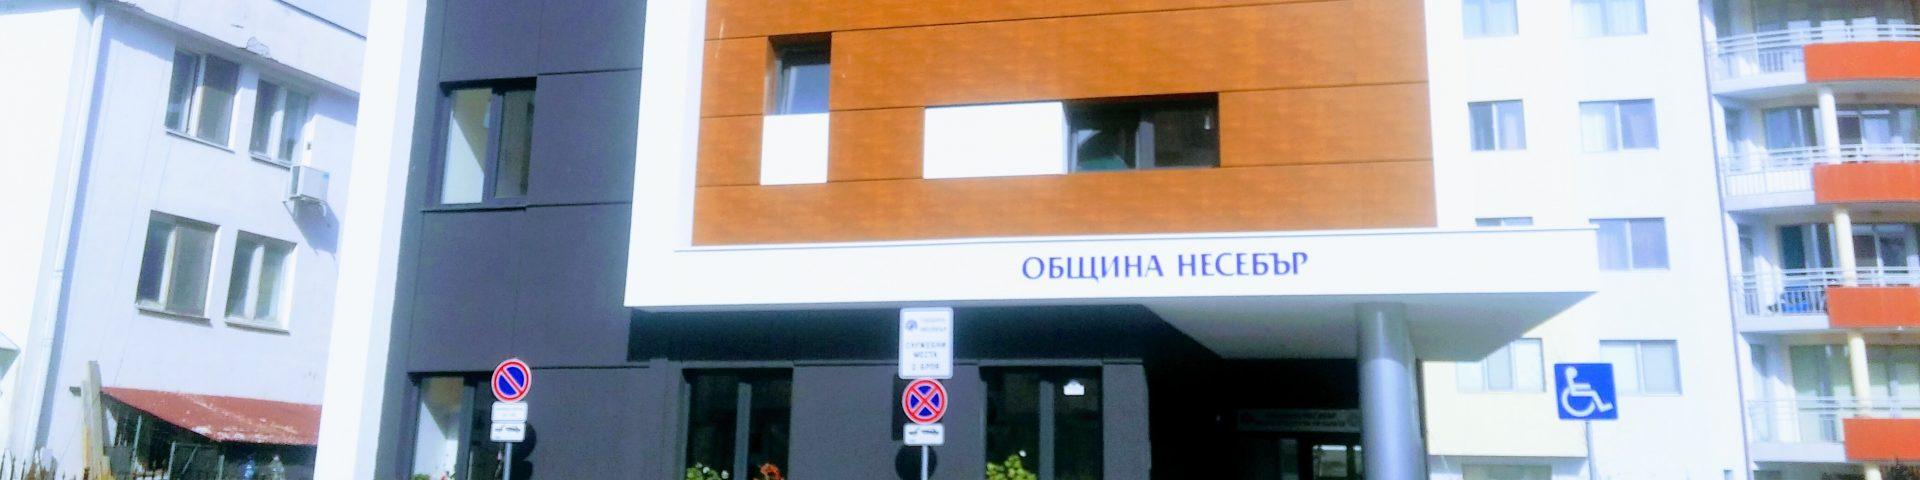 Община Несебър в Слънчев Бряг_налоги на недвижимость